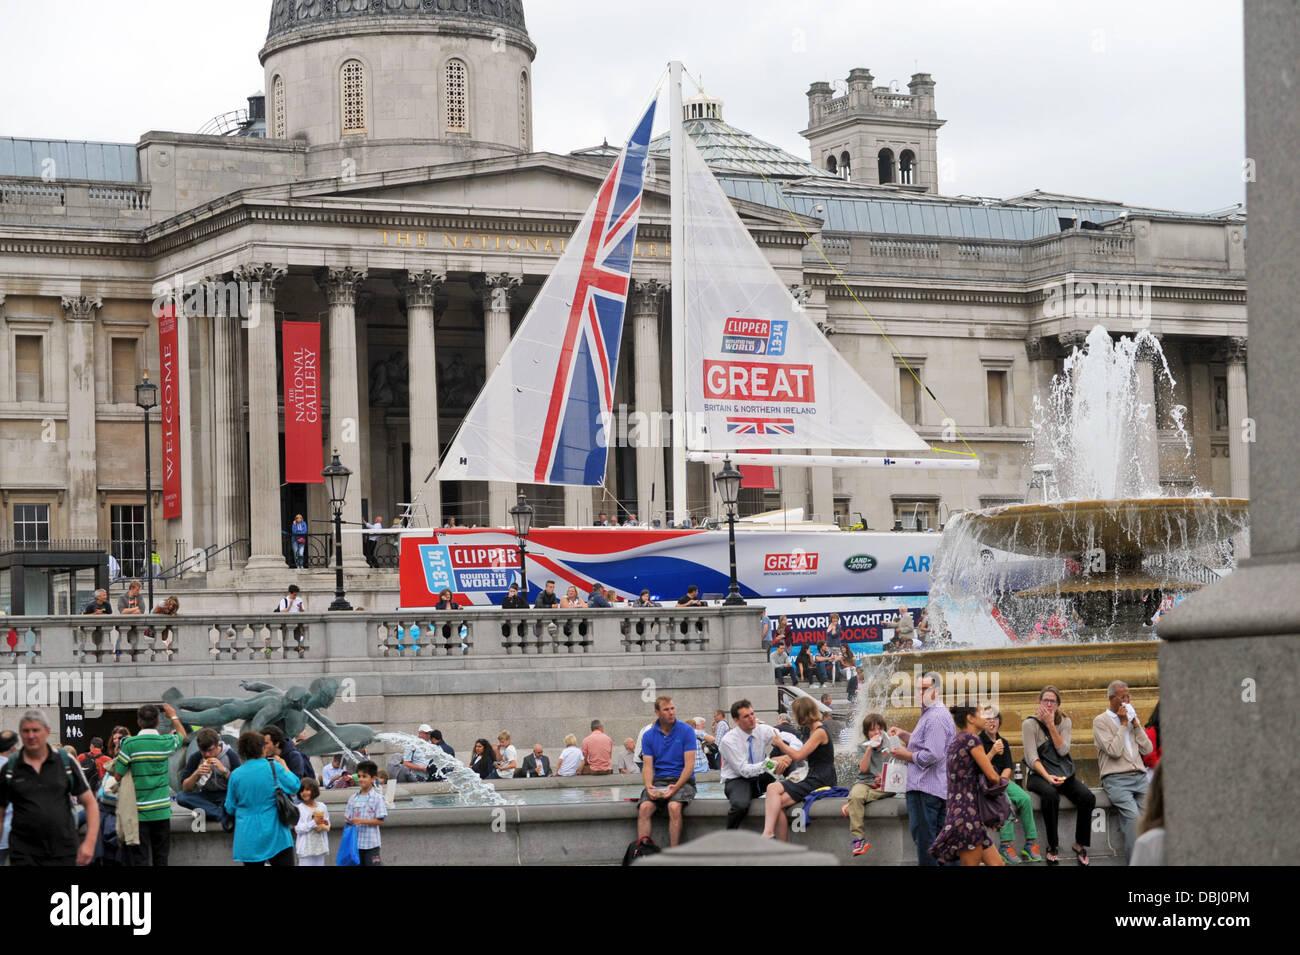 London, UK. Clipper Great Britain in Trafalgar Square London. The boat will compete in the 2013-14 Clipper Round Stock Photo